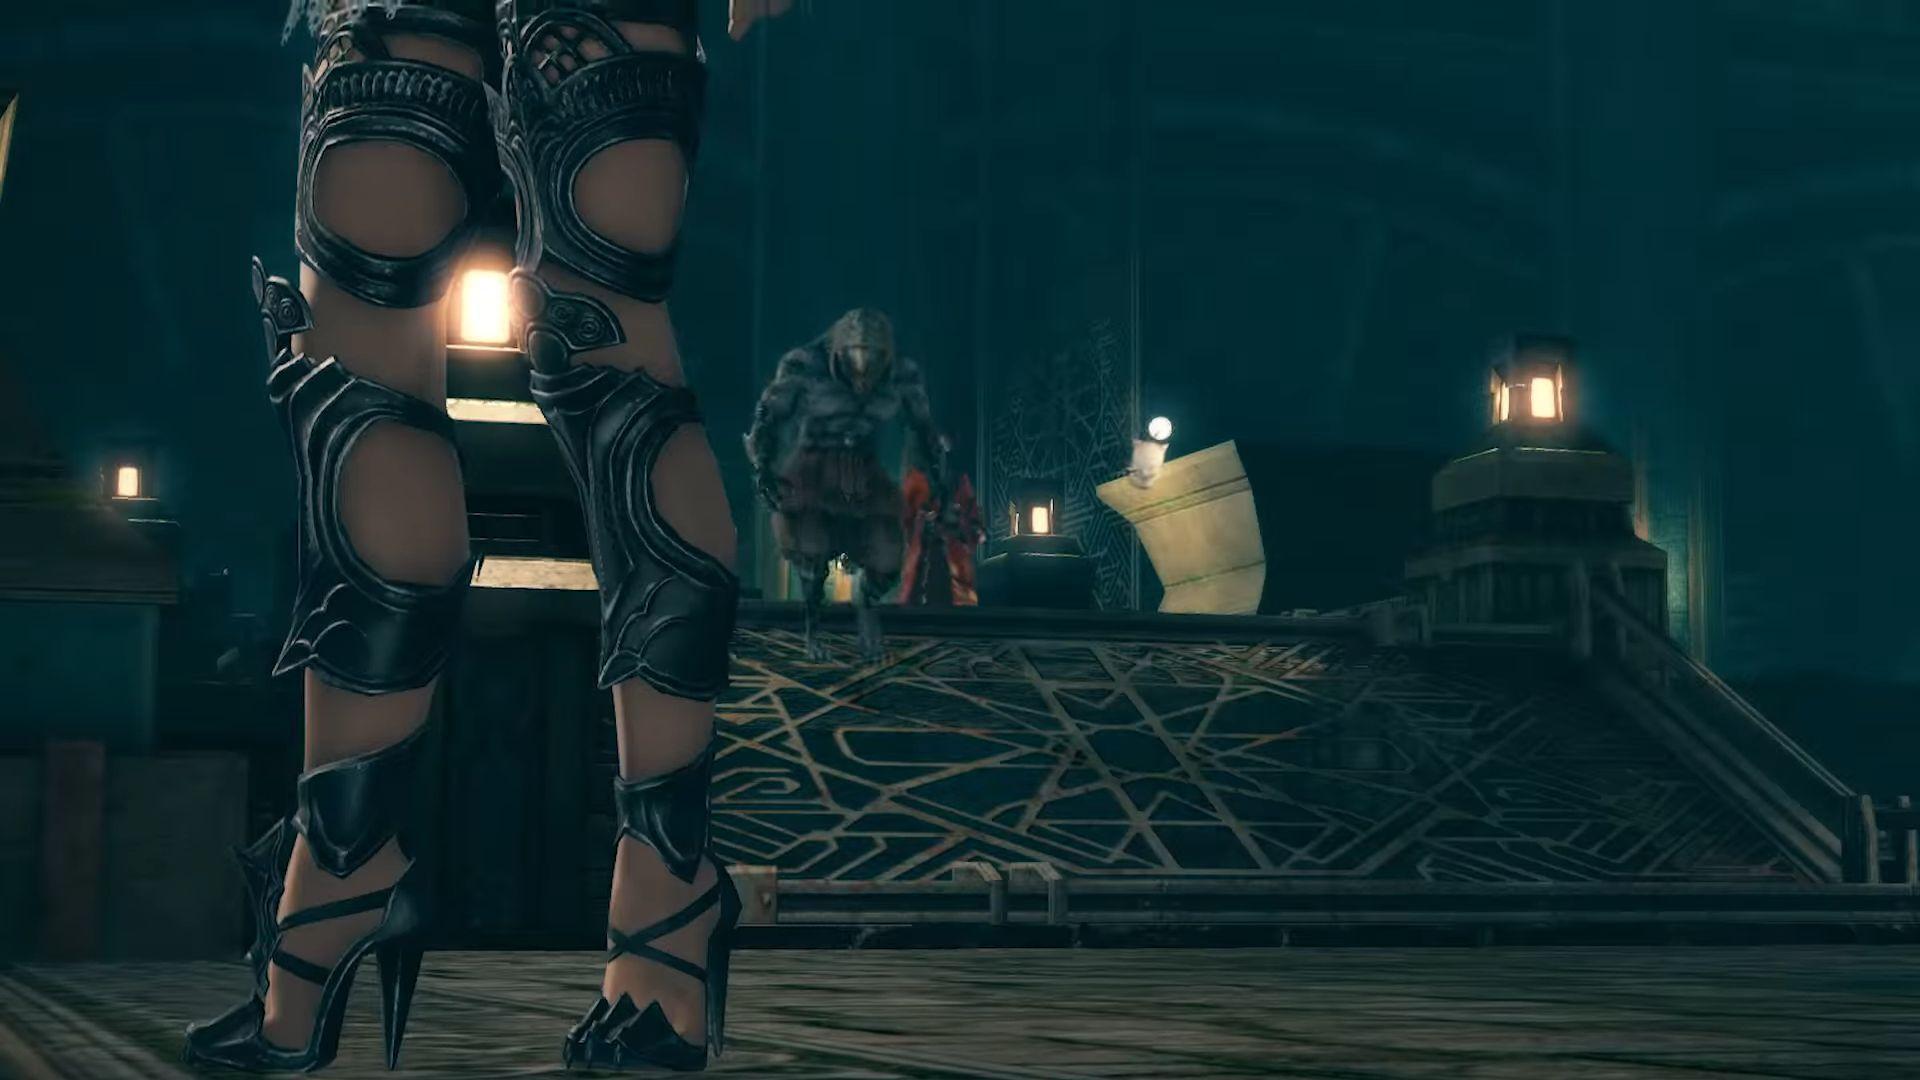 Final Fantasy XIV Viera Tease